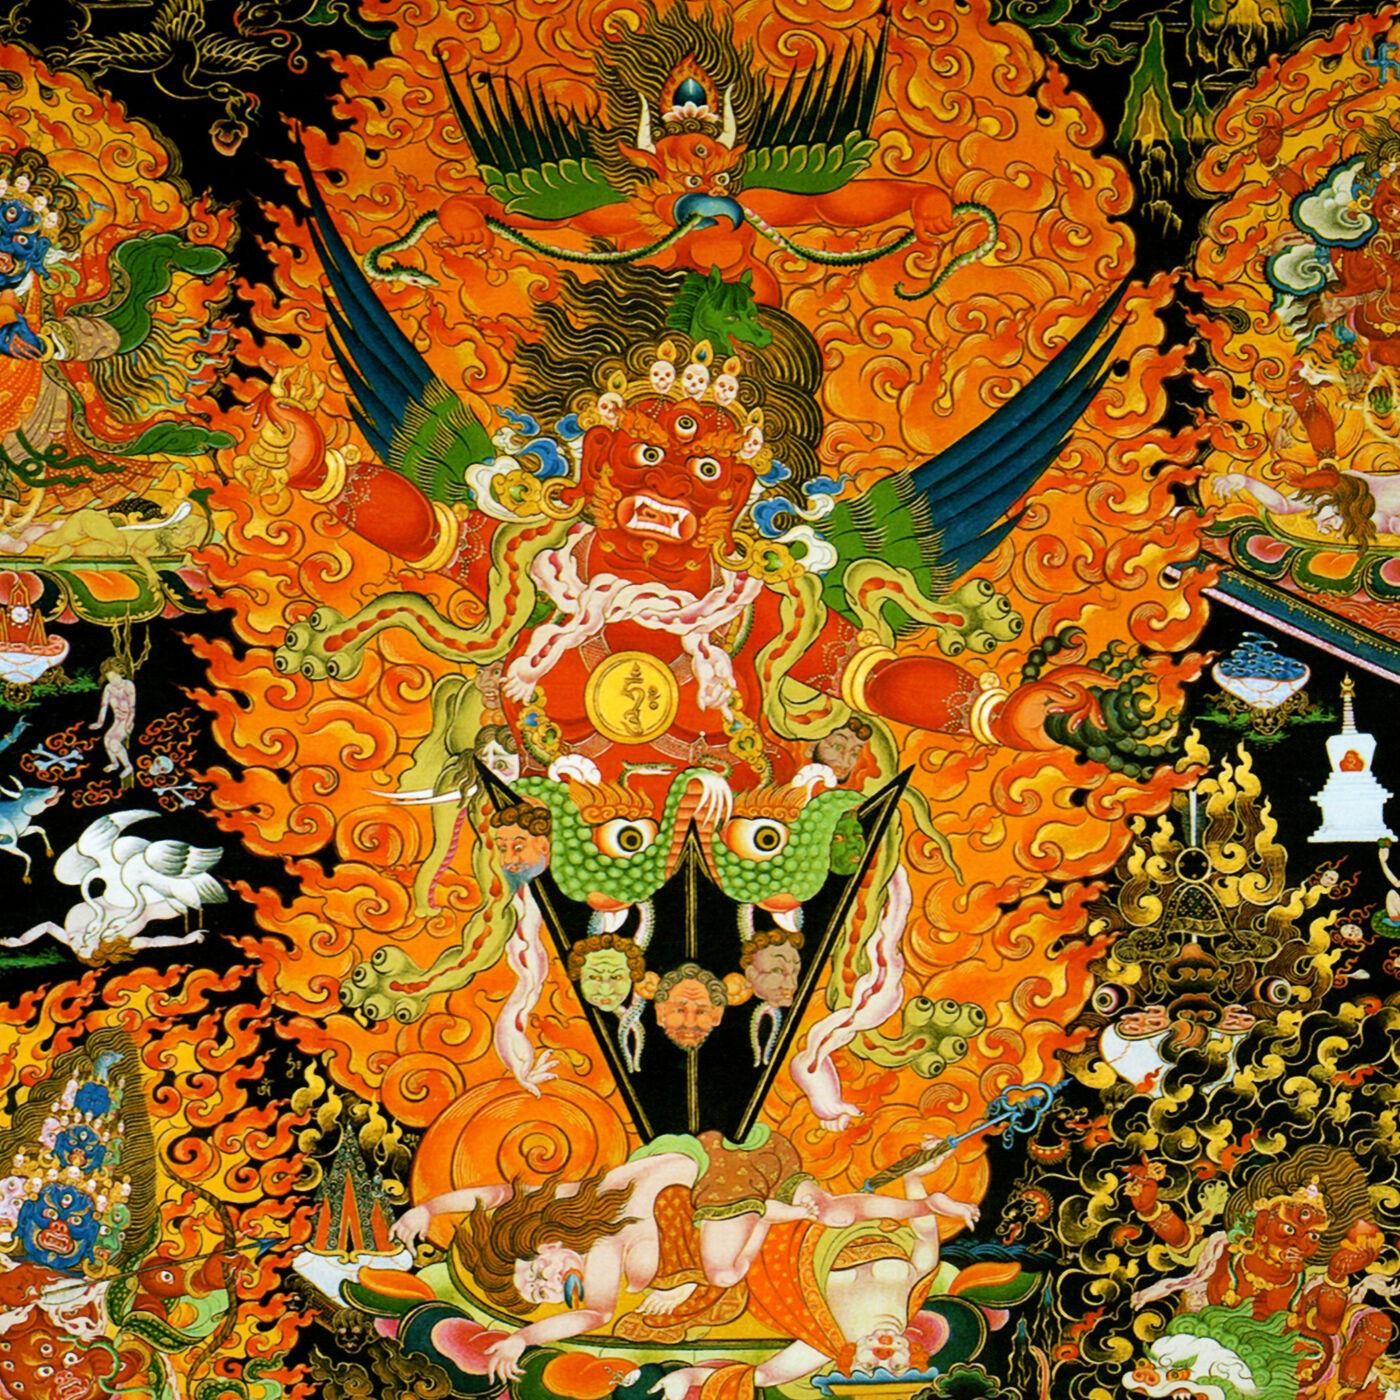 3Worlds Shamanism S03E07 - Tibetan Shamanism and Magic - Part Two